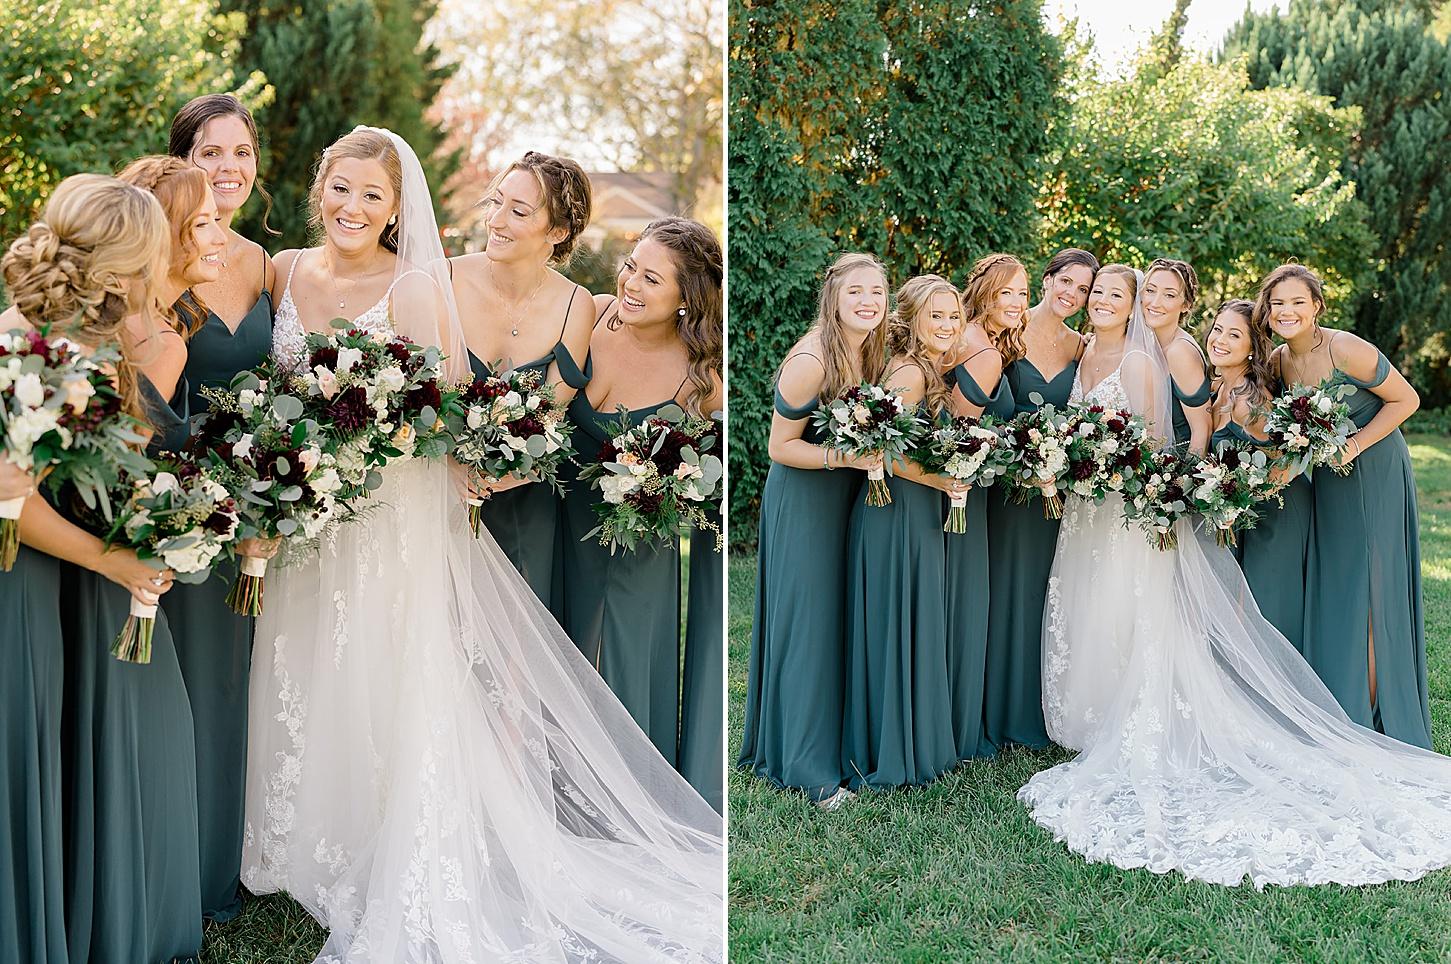 Valenzano Winery Vitners Pavillion Wedding Photography by Magdalena Studios 0015